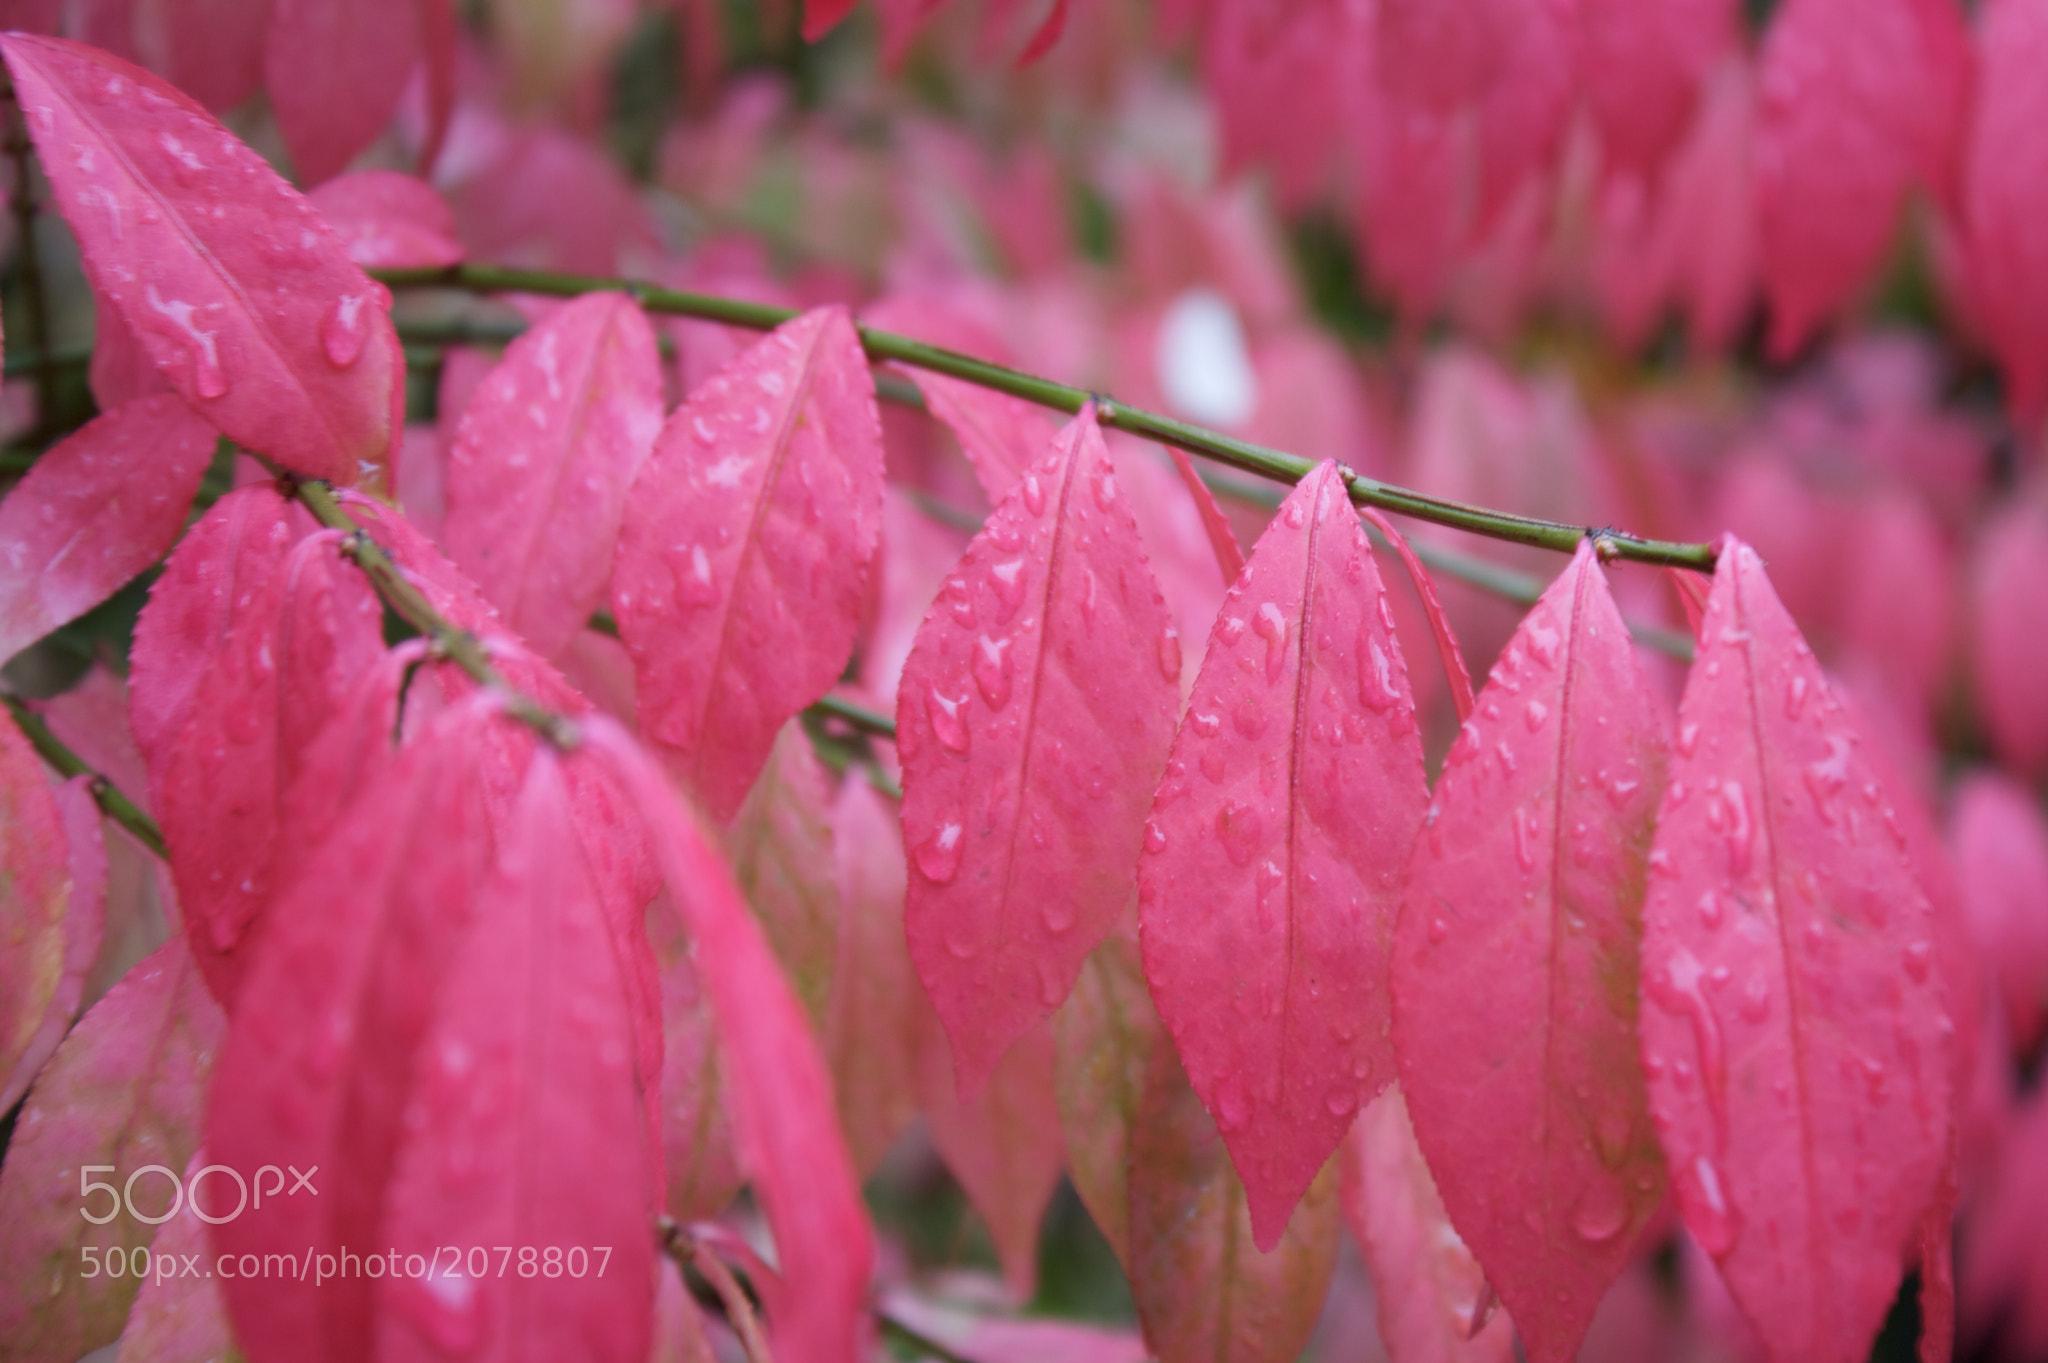 Photograph Autumn by Pradeep Reddy on 500px